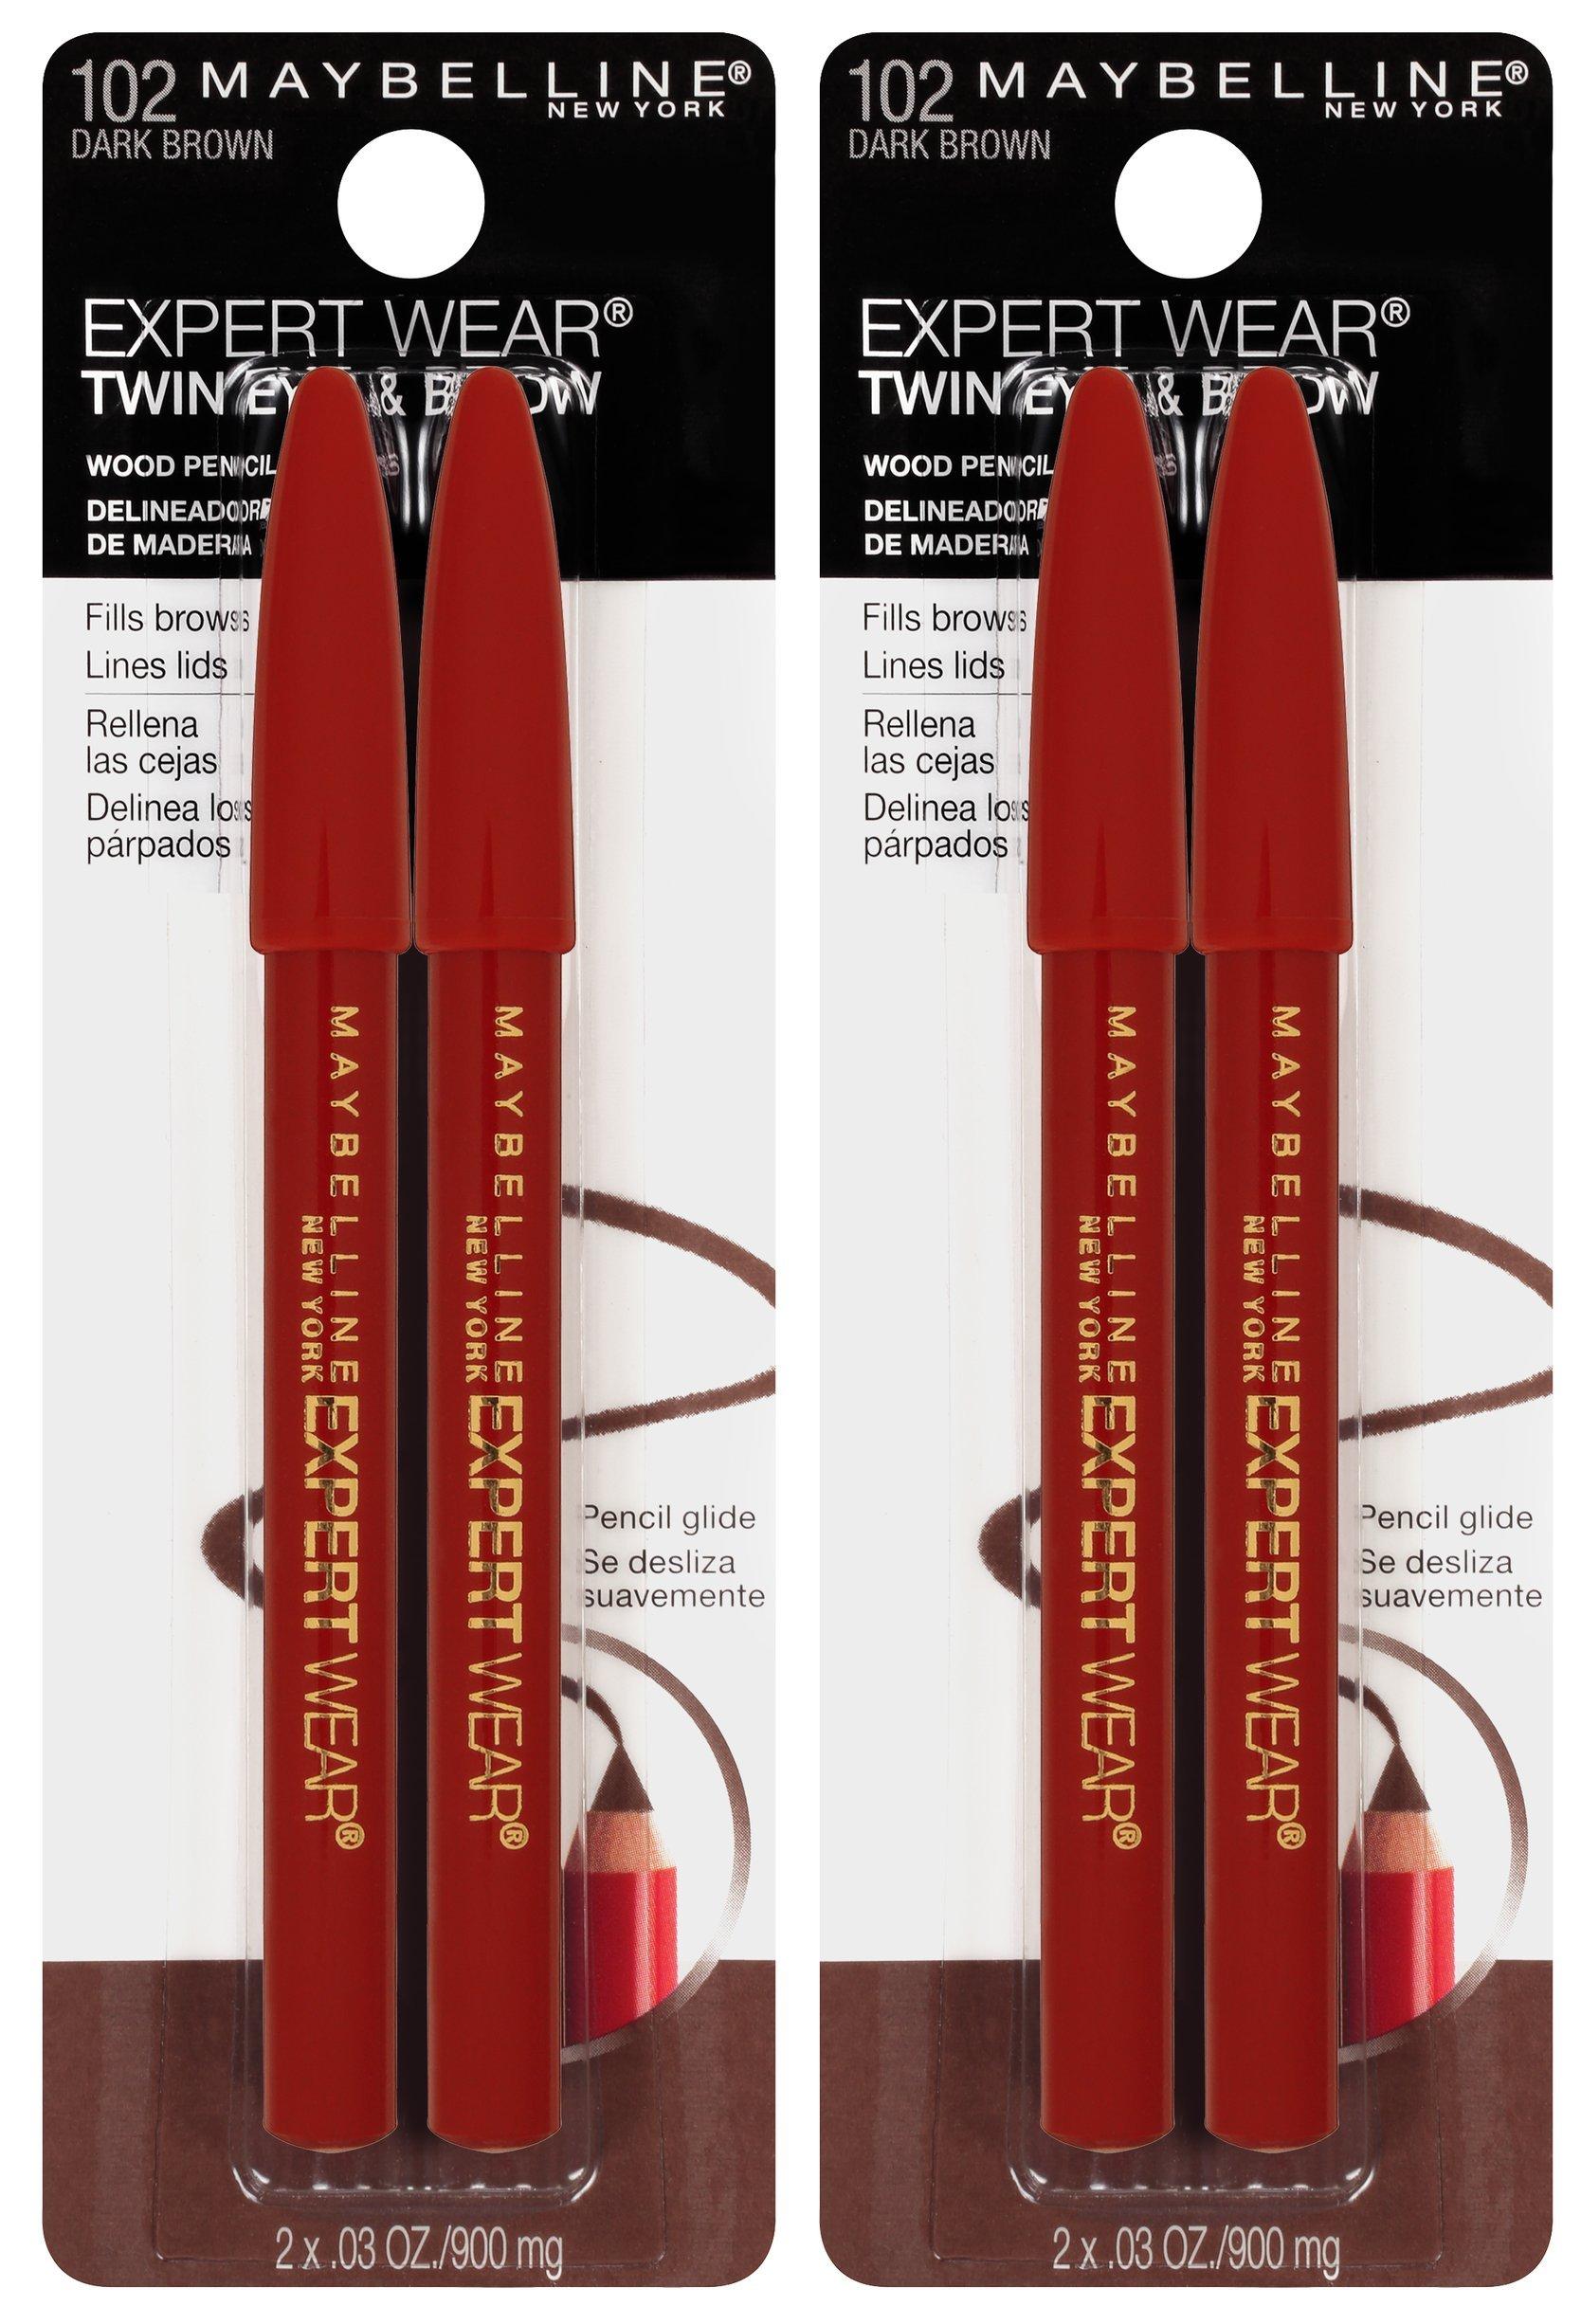 Maybelline New York Expert Wear Twin Brow & Eye Pencils Makeup, Dark Brown, 2 Count (Pack of 2)